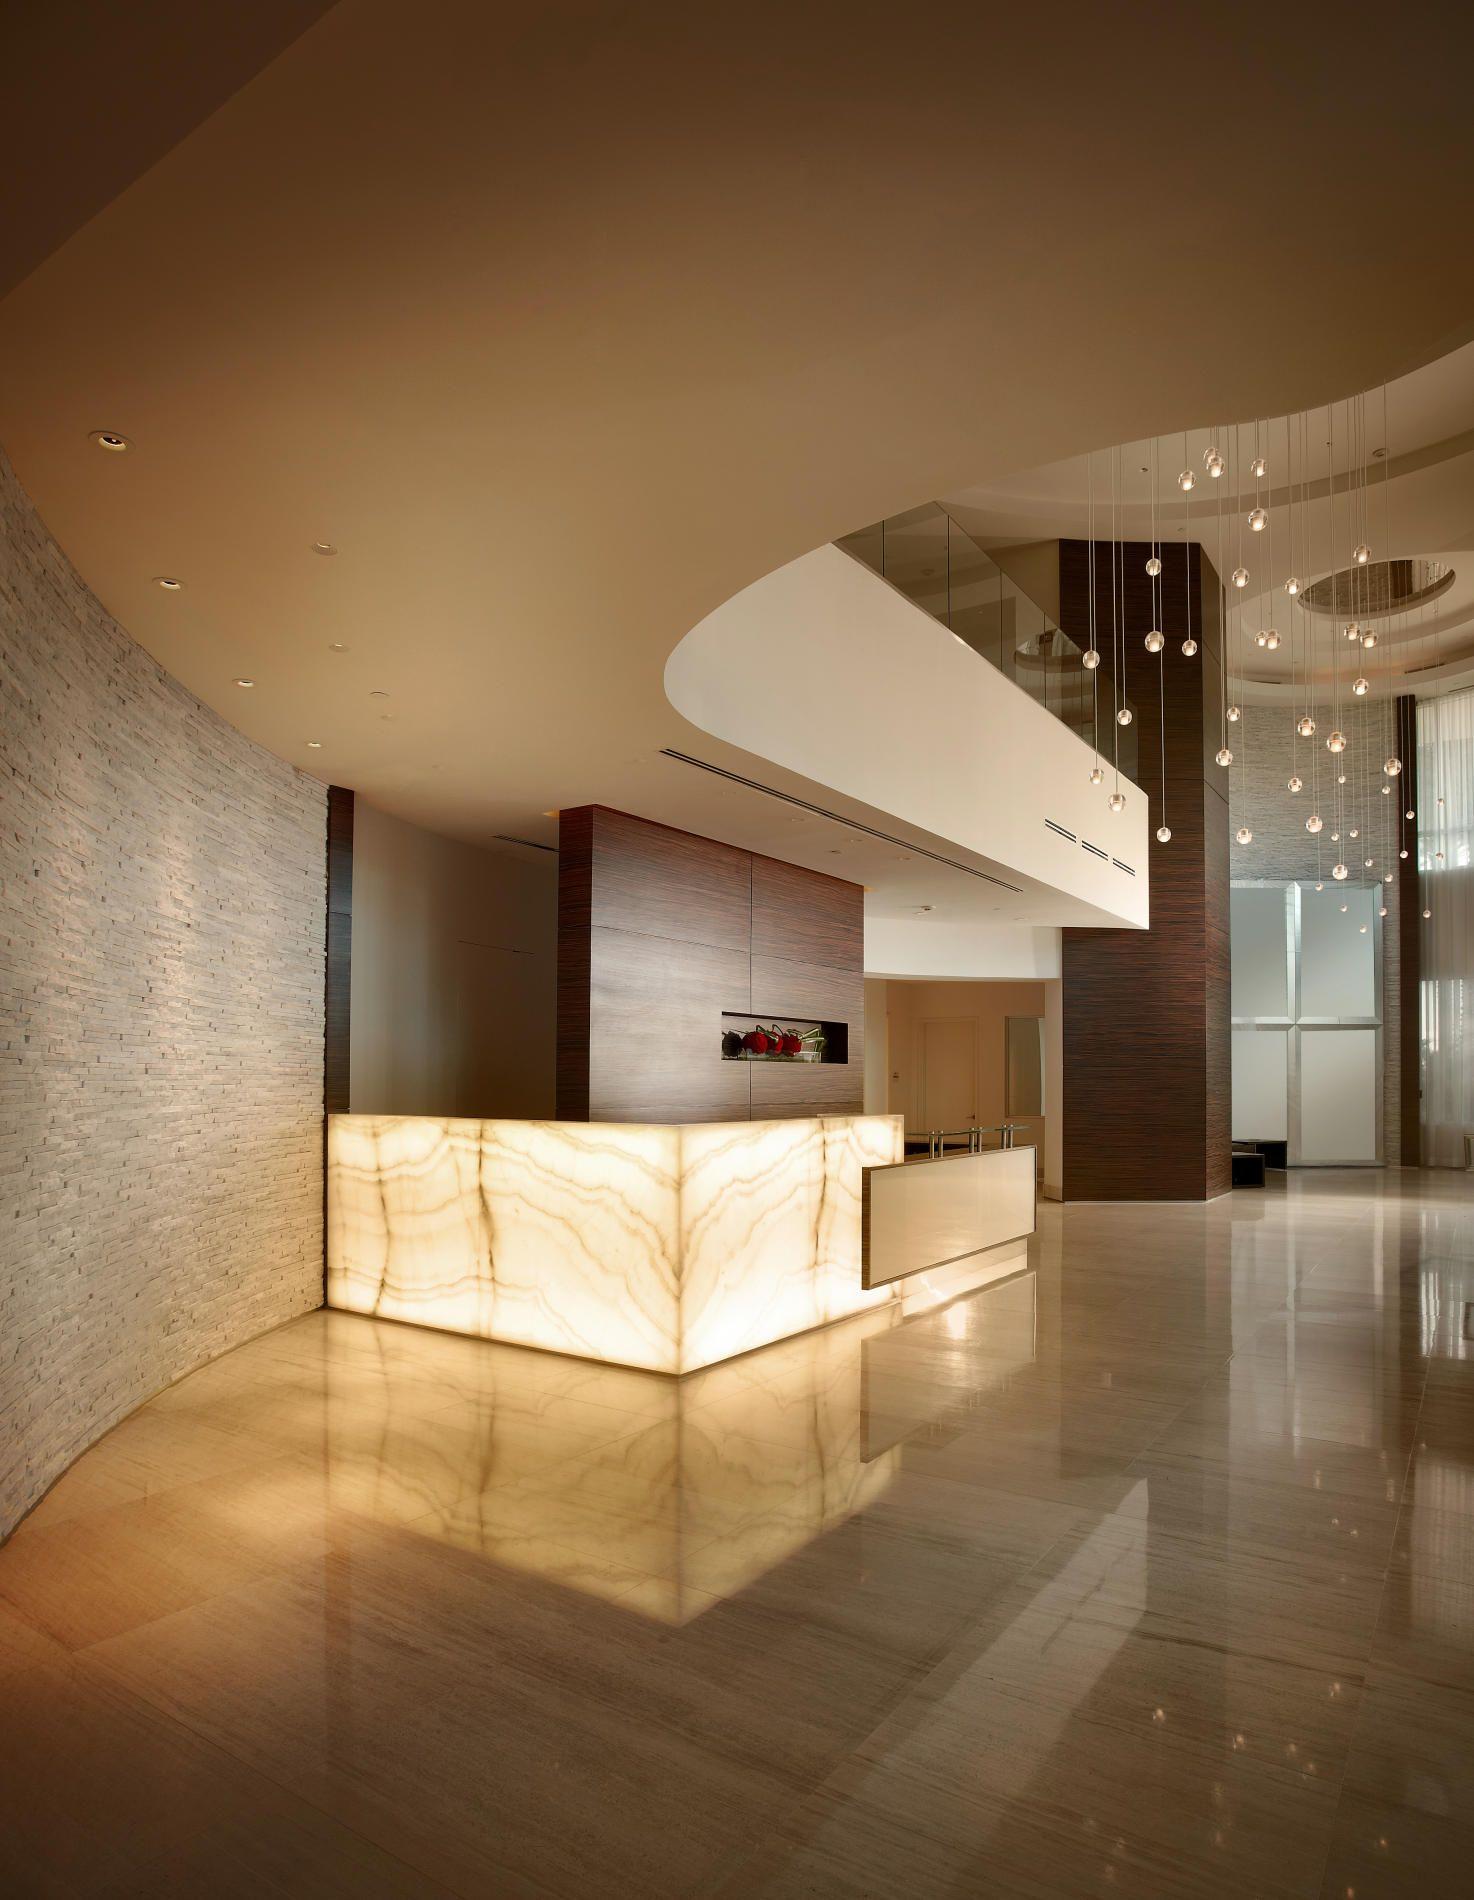 Modern Hotel Rooms Designs: Дизайн, Дизайн интерьера